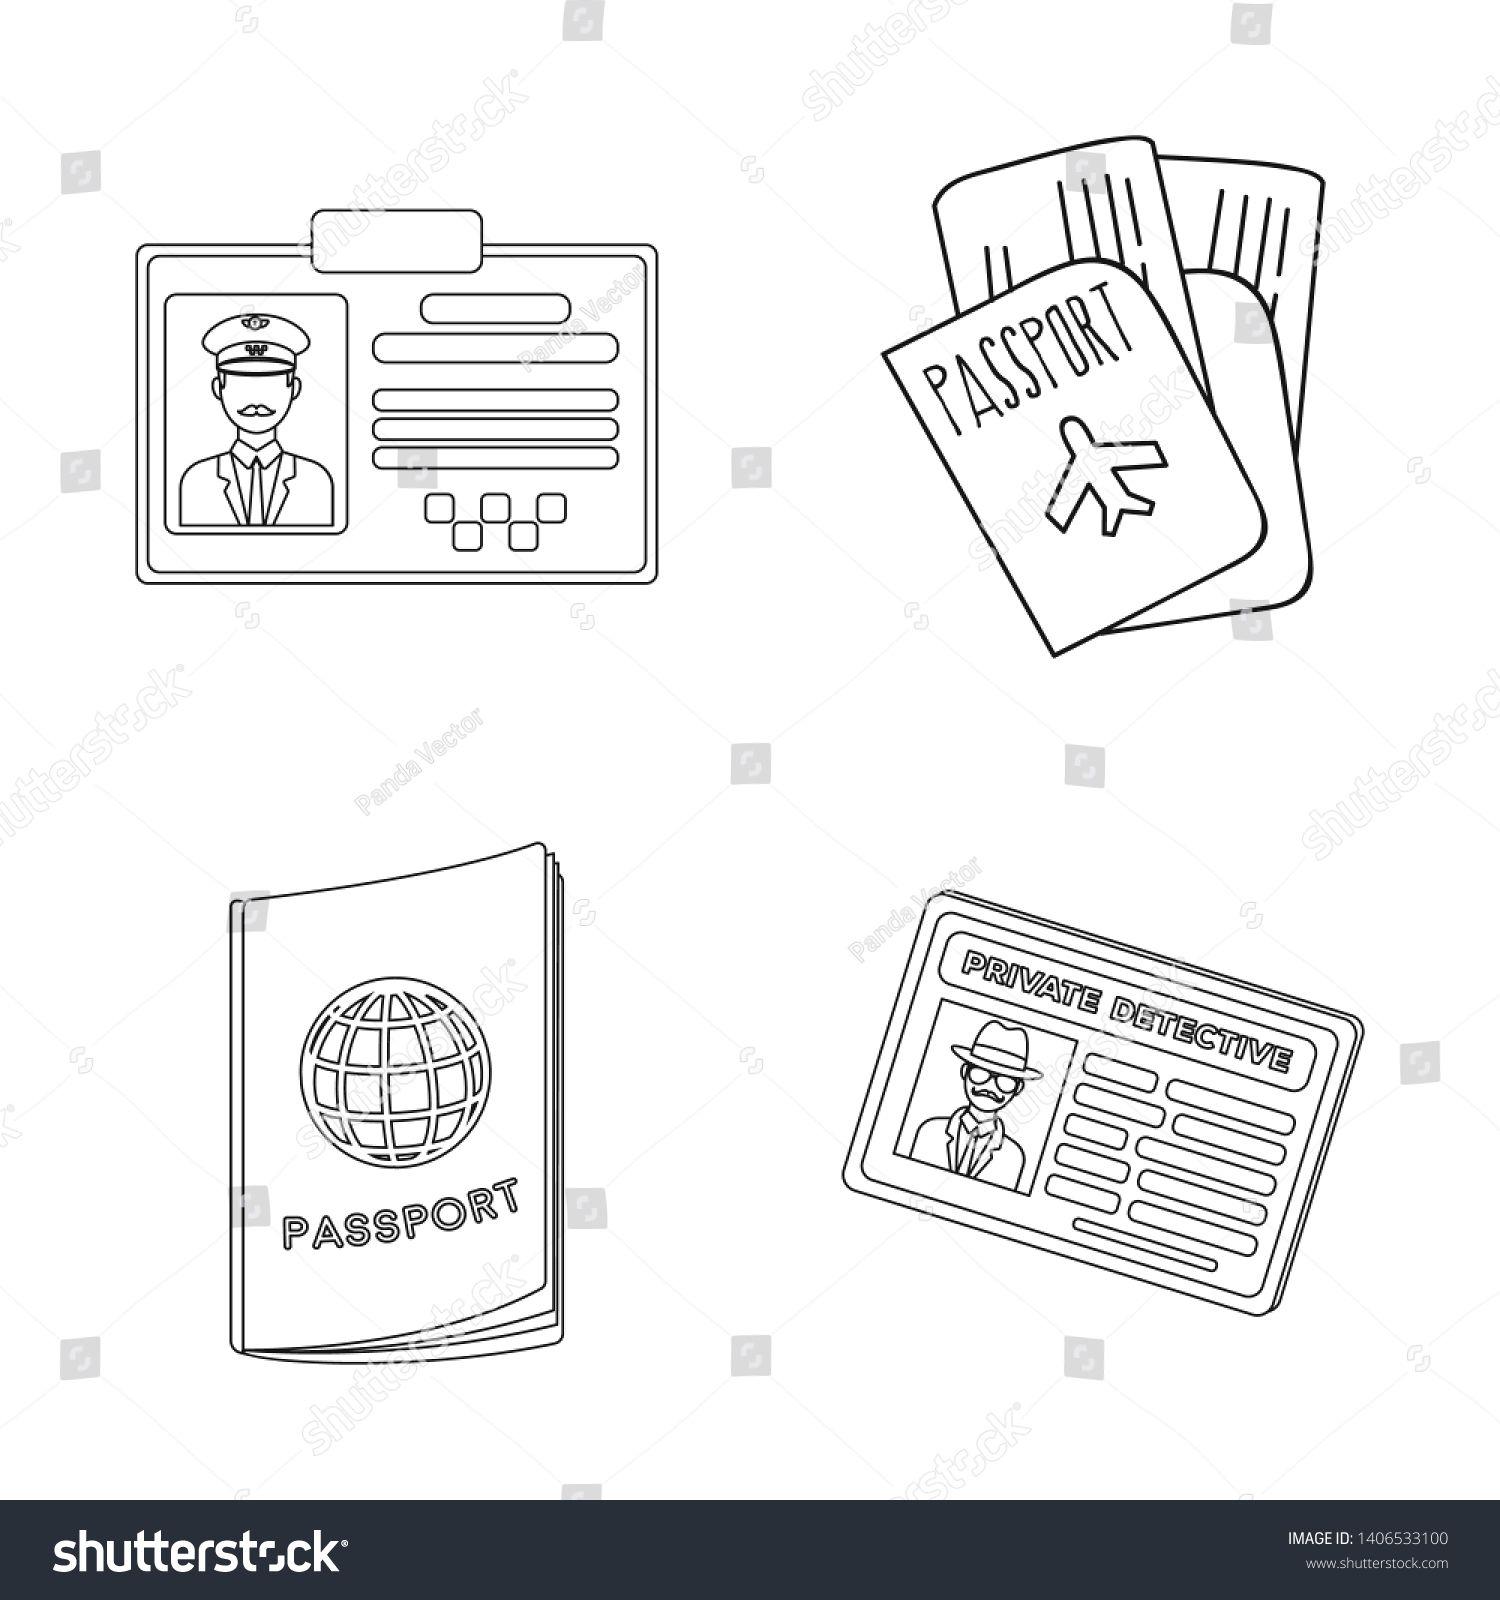 25+ Passport Clipart Black And White